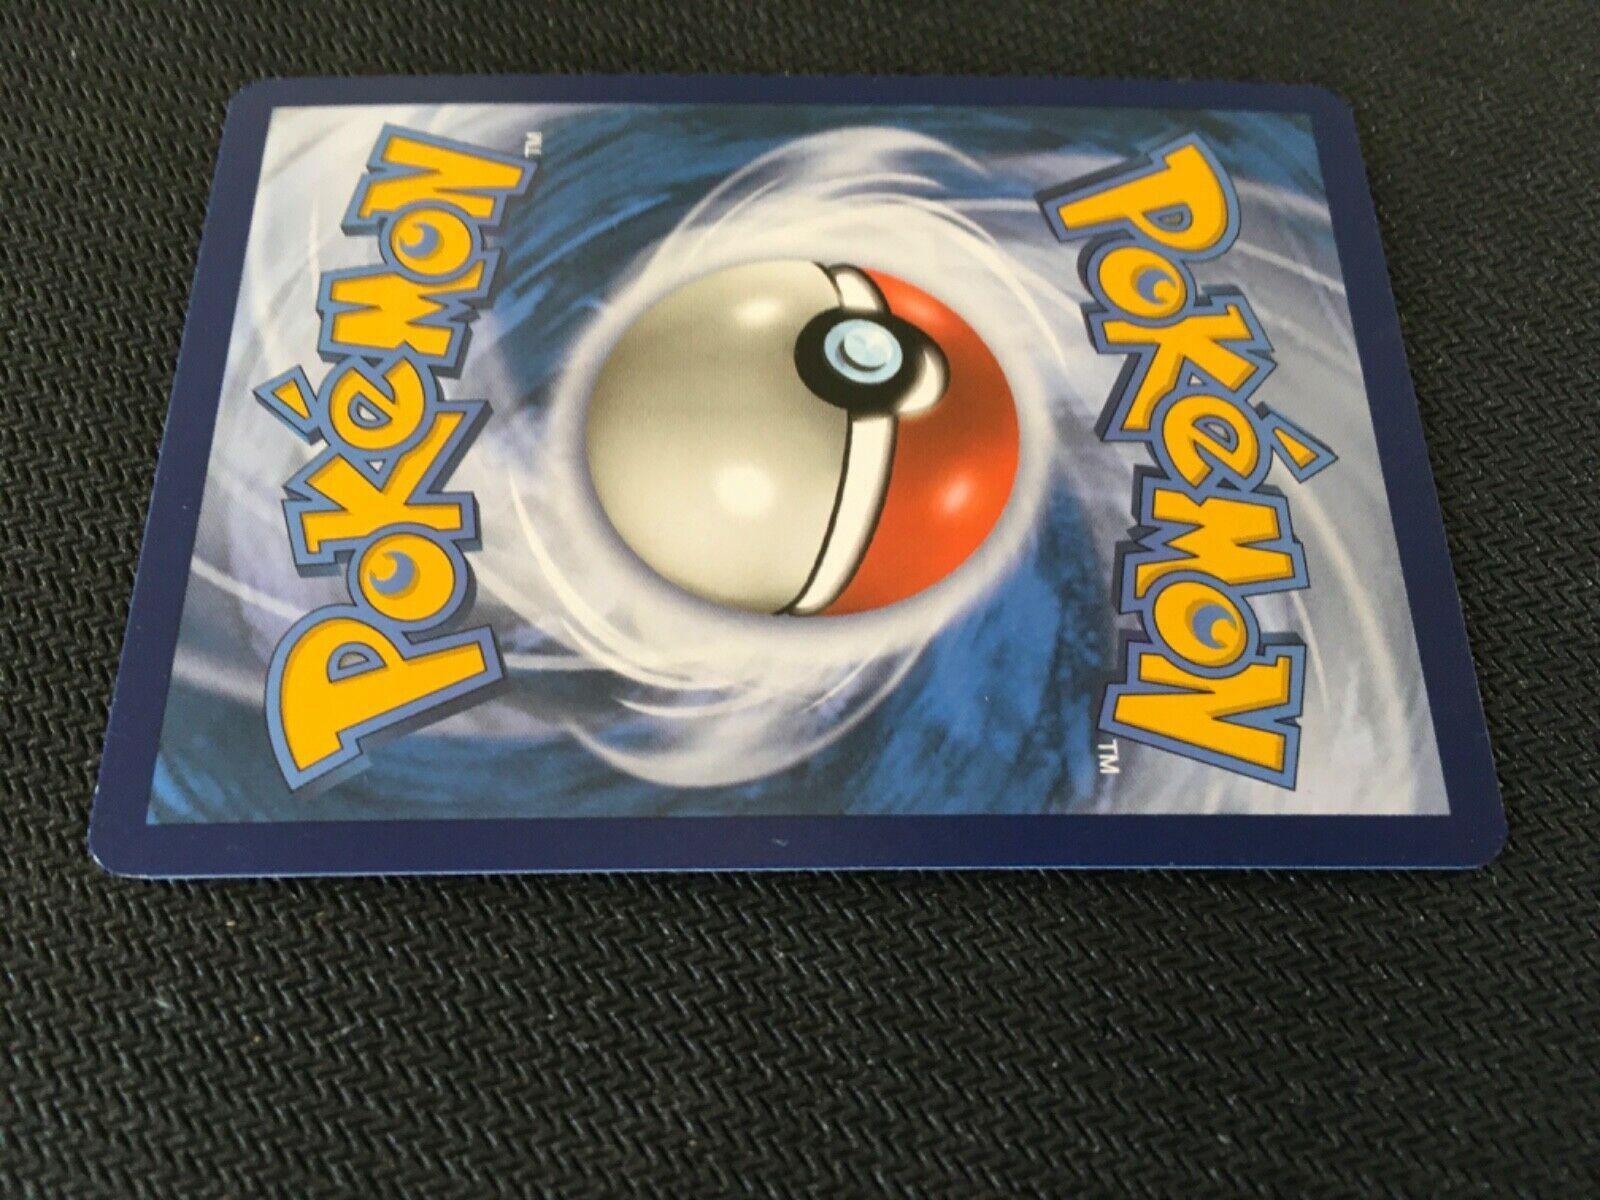 Buzzwole Rare Holo League Promo Pokemon Card Trainer Item Forbidden Light 77/131 - Image 9